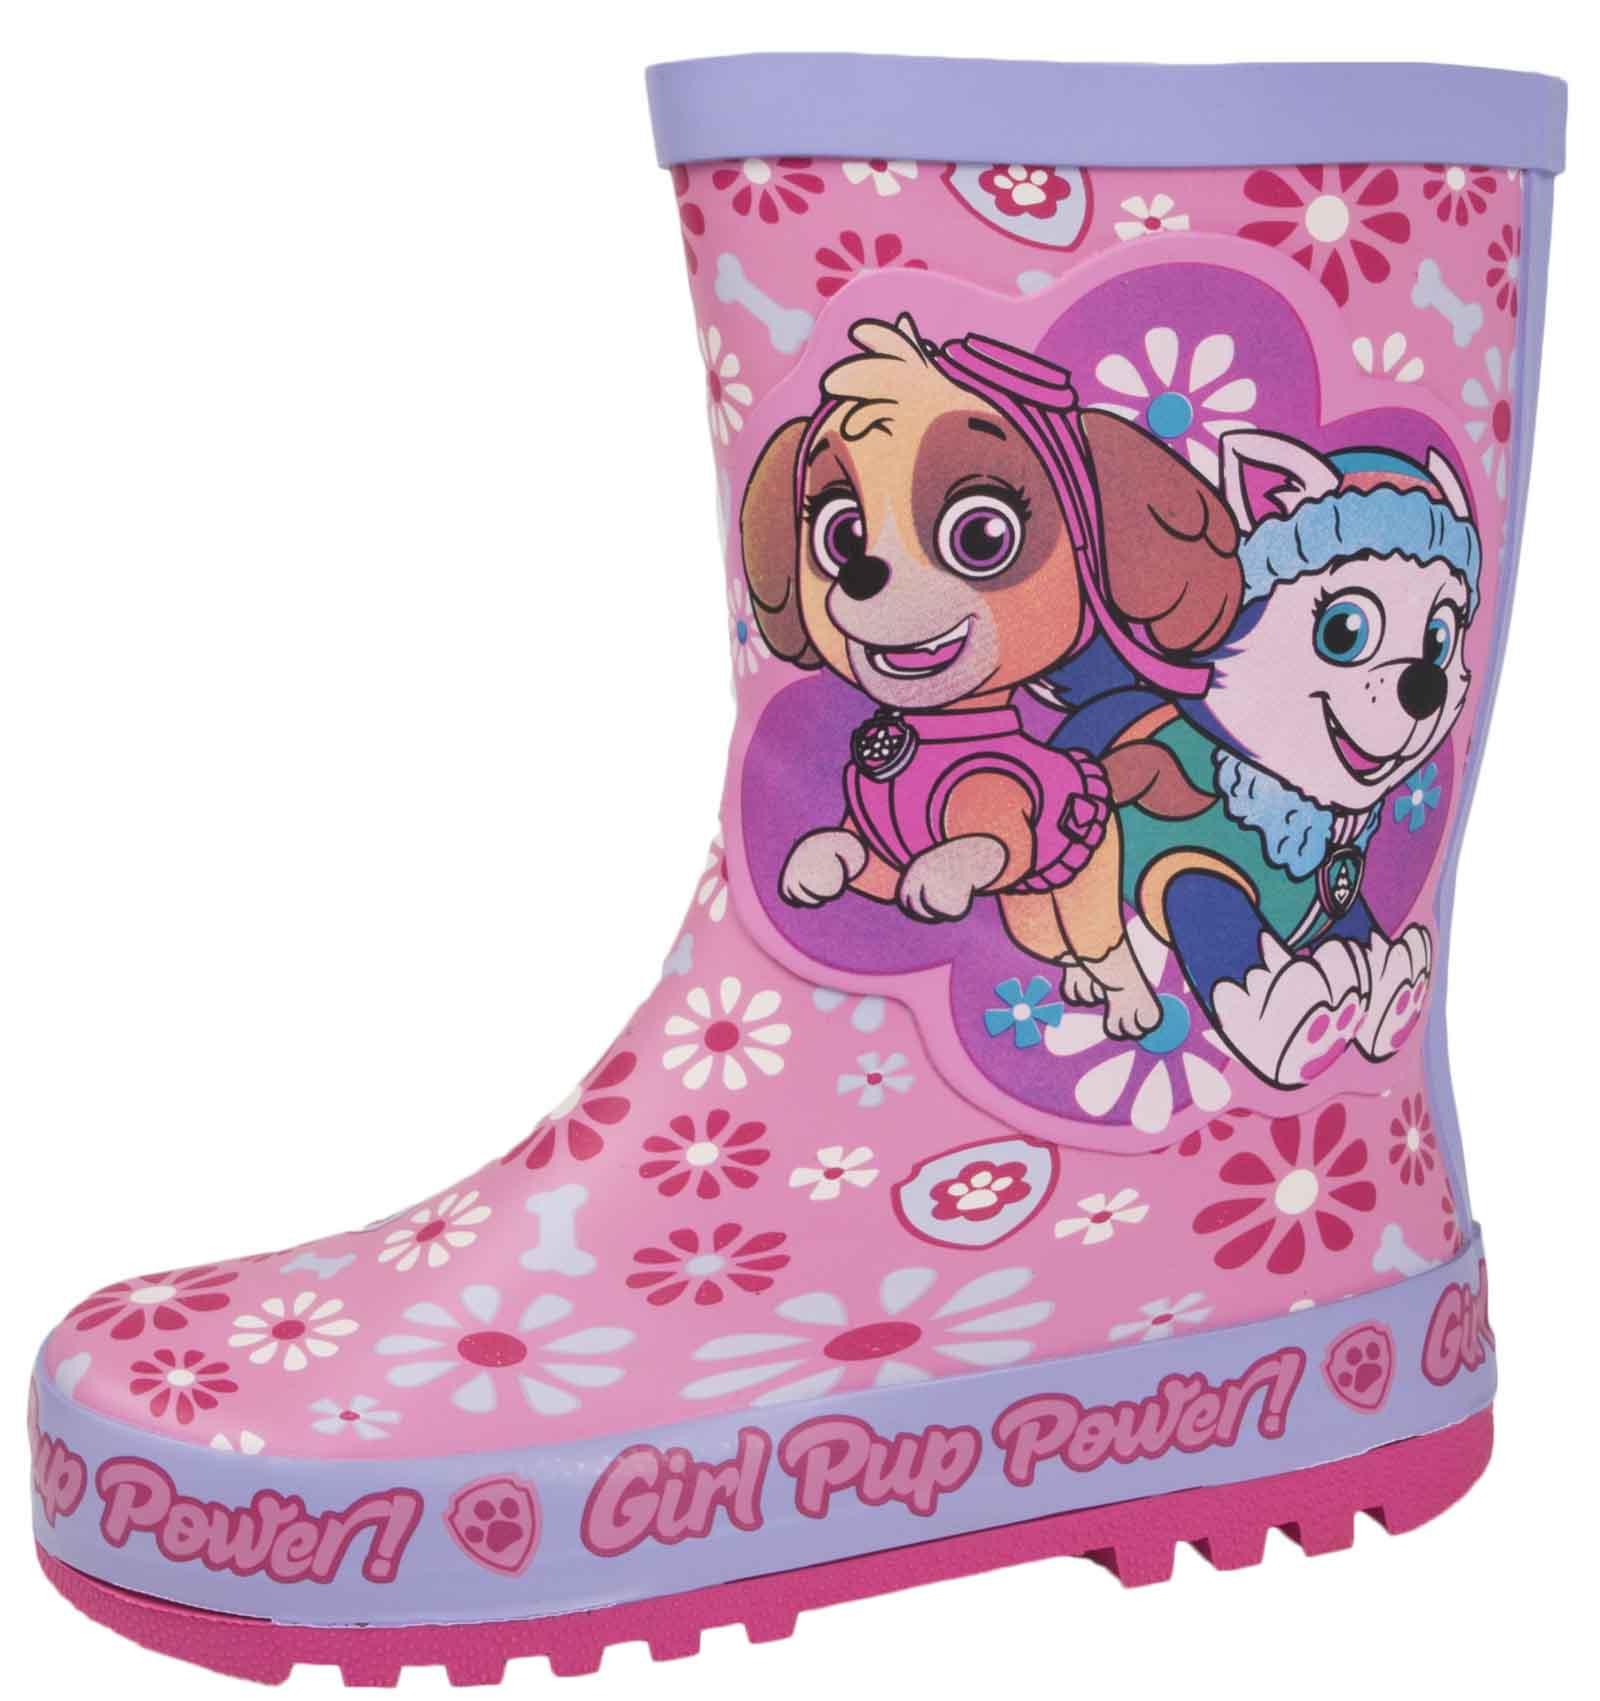 Chicas Paw Patrol Wellington Botas Rosa De Goma Para Lluvia Botas De Agua Botas De Nieve Niños Talla